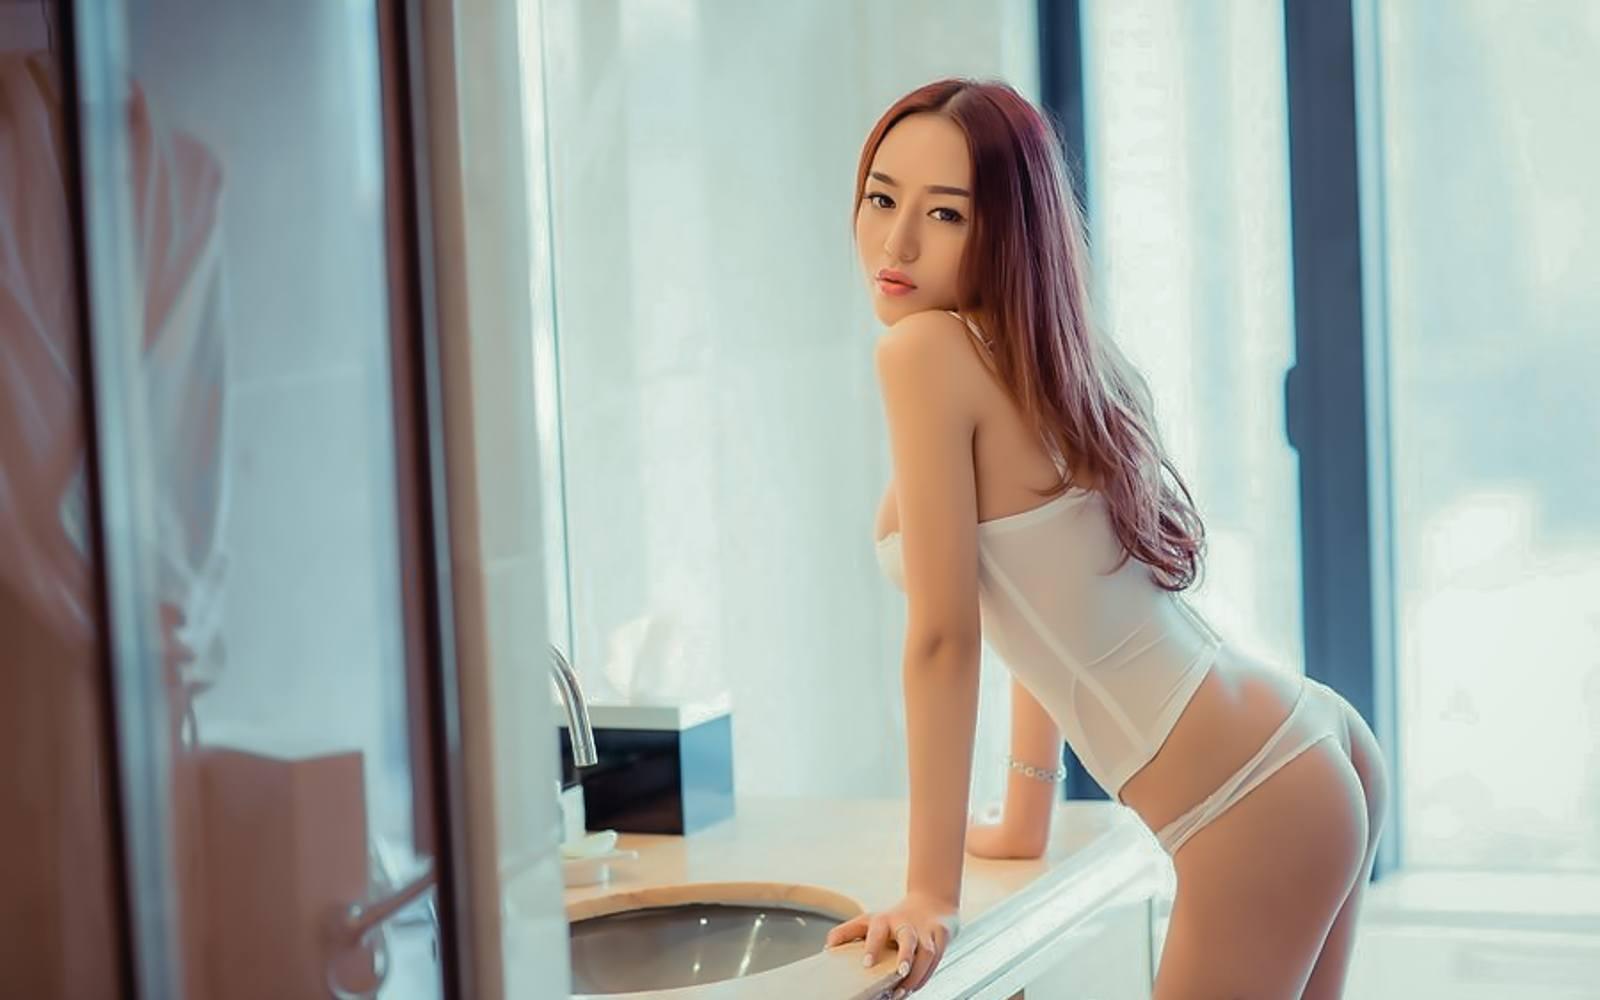 Mi%2BYeon%2BLee%2B%25E6%259D%258E%25E7%25BE%258E%25E5%25A6%258D%2B %2BBubbles Covered%2BNude%2BOutdoors%2B %2B009 - Korean Nude - Big Albom Remain #A-korean girl